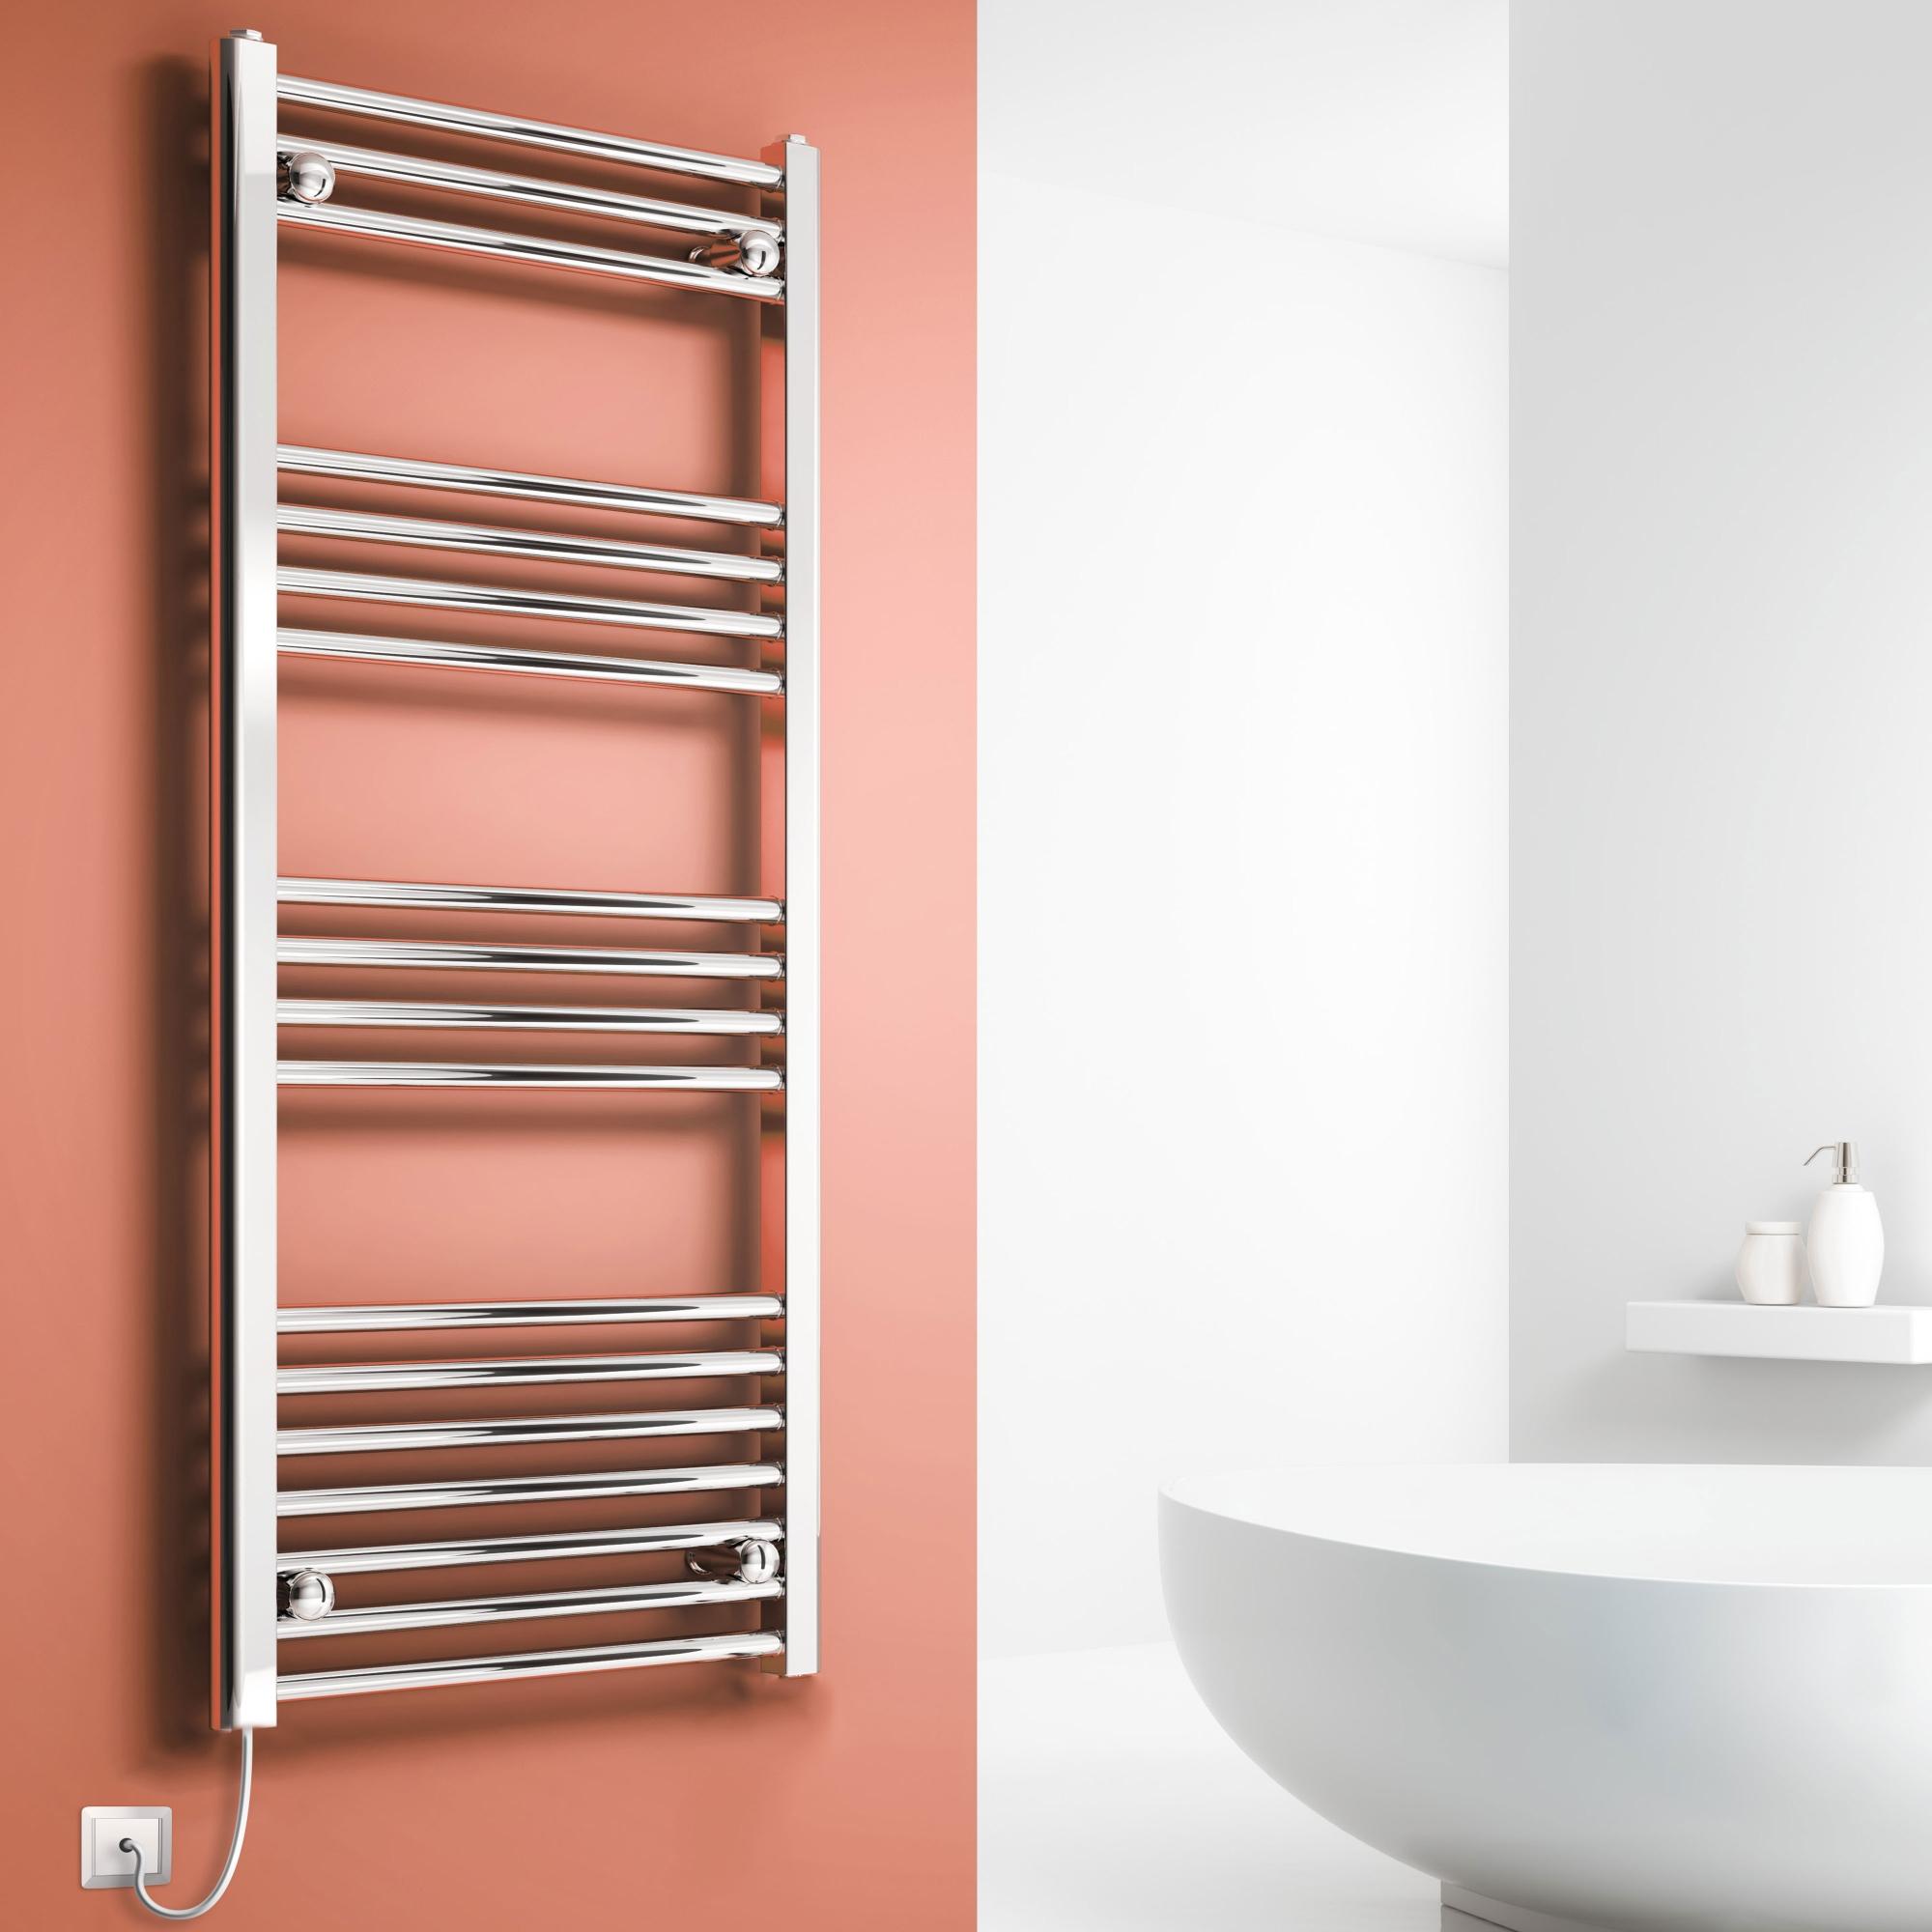 Reina Capo Straight Electric Heated Towel Rail 1200mm H x 400mm W Chrome